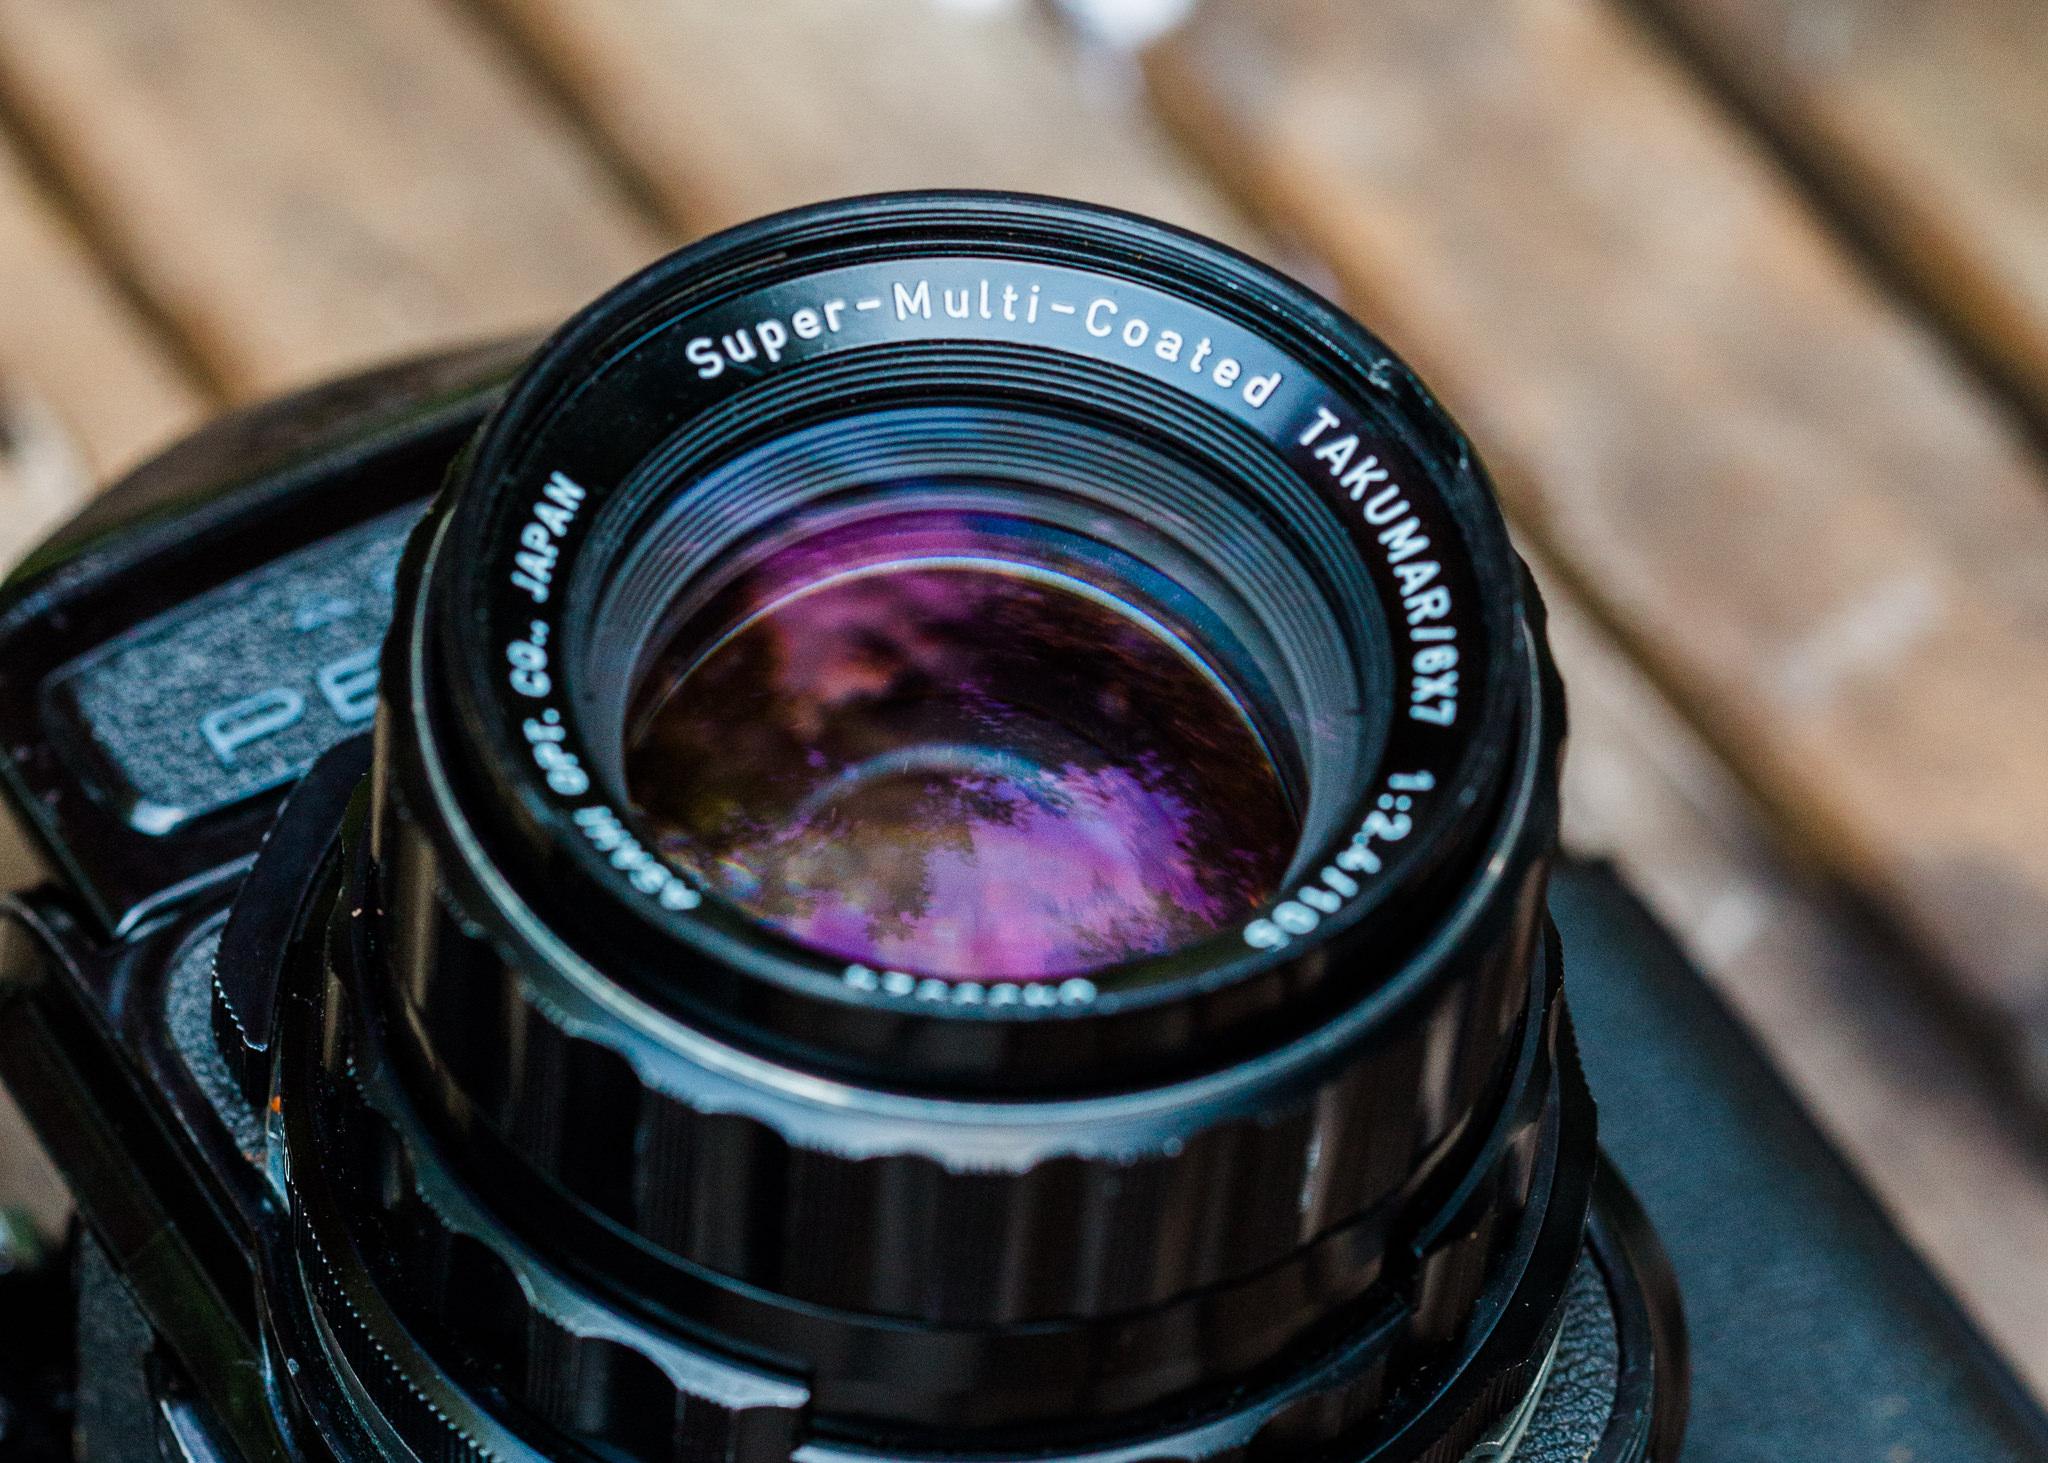 Super Multi Coated Takumar Pentax 6x7 105mm f/2.4 Lens